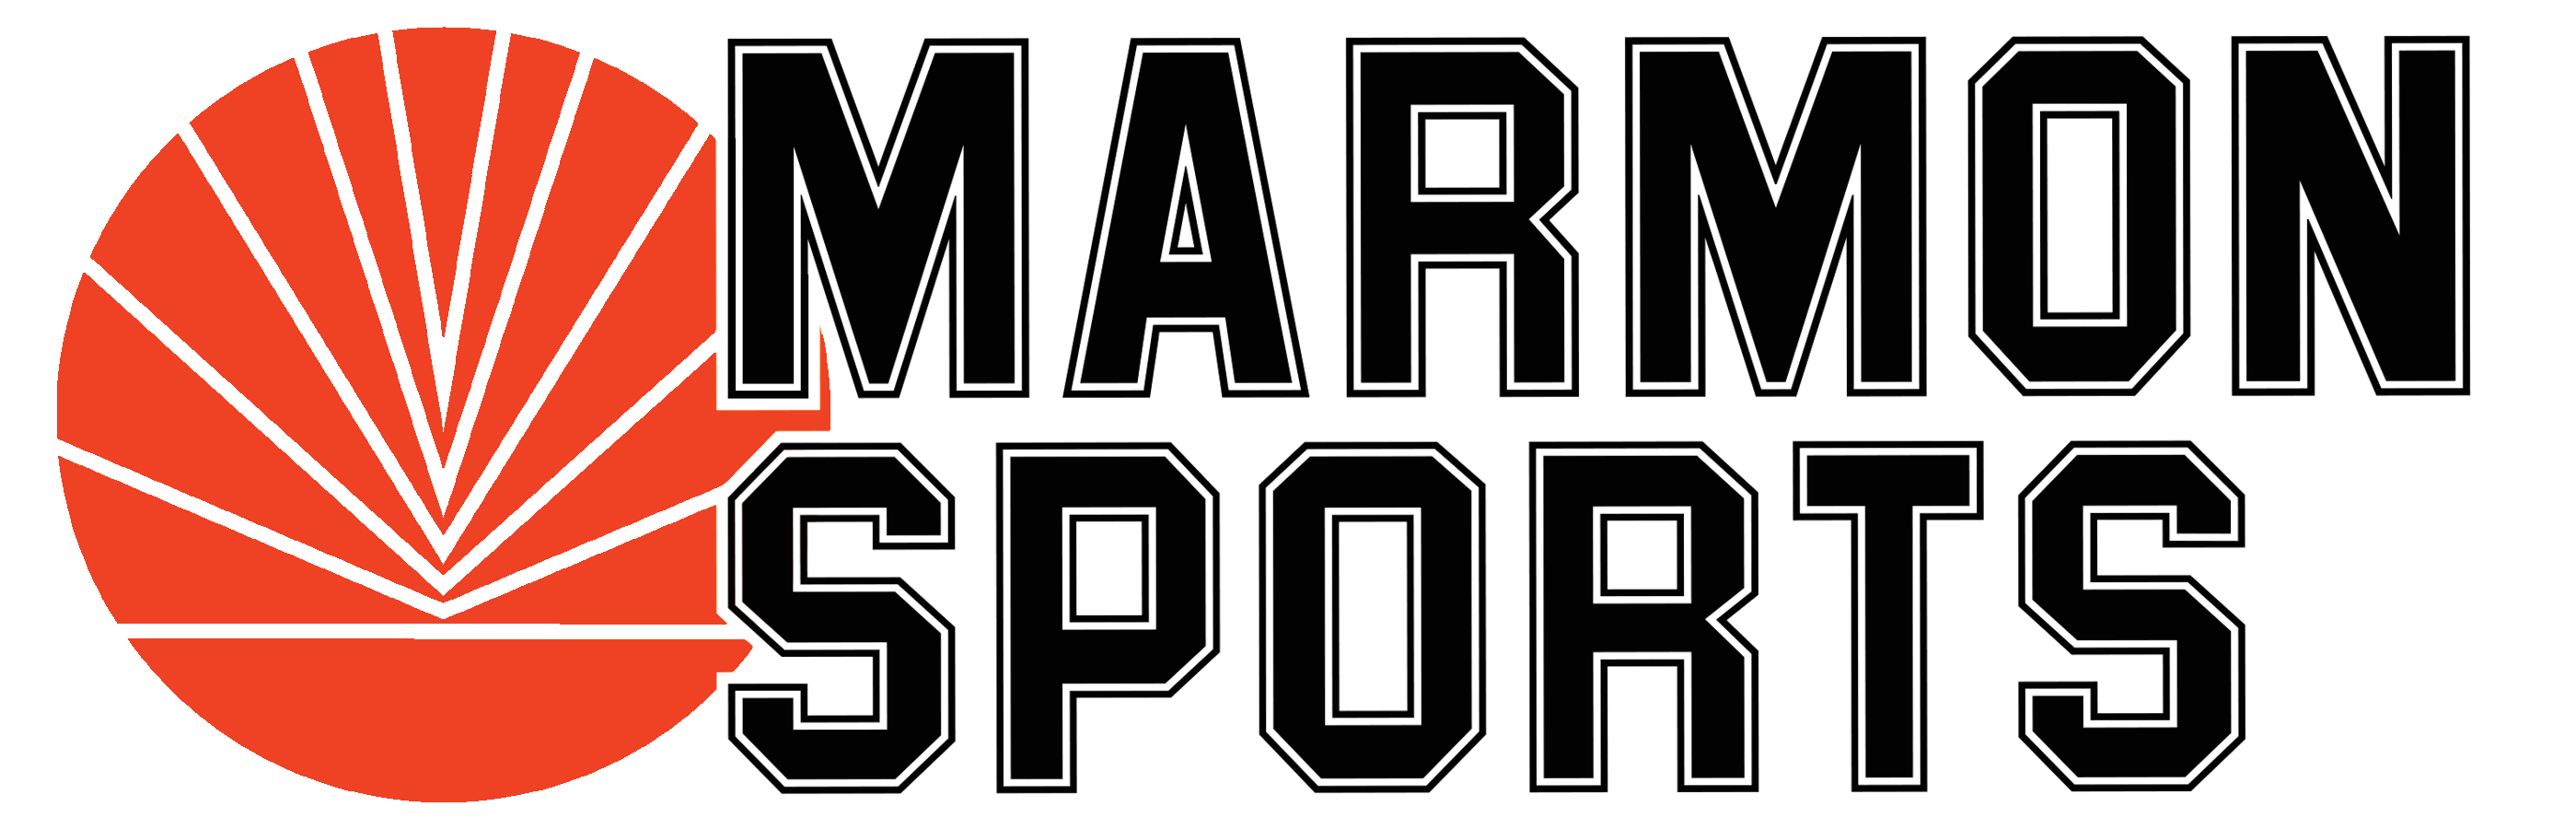 logo ms 2019 test4.png